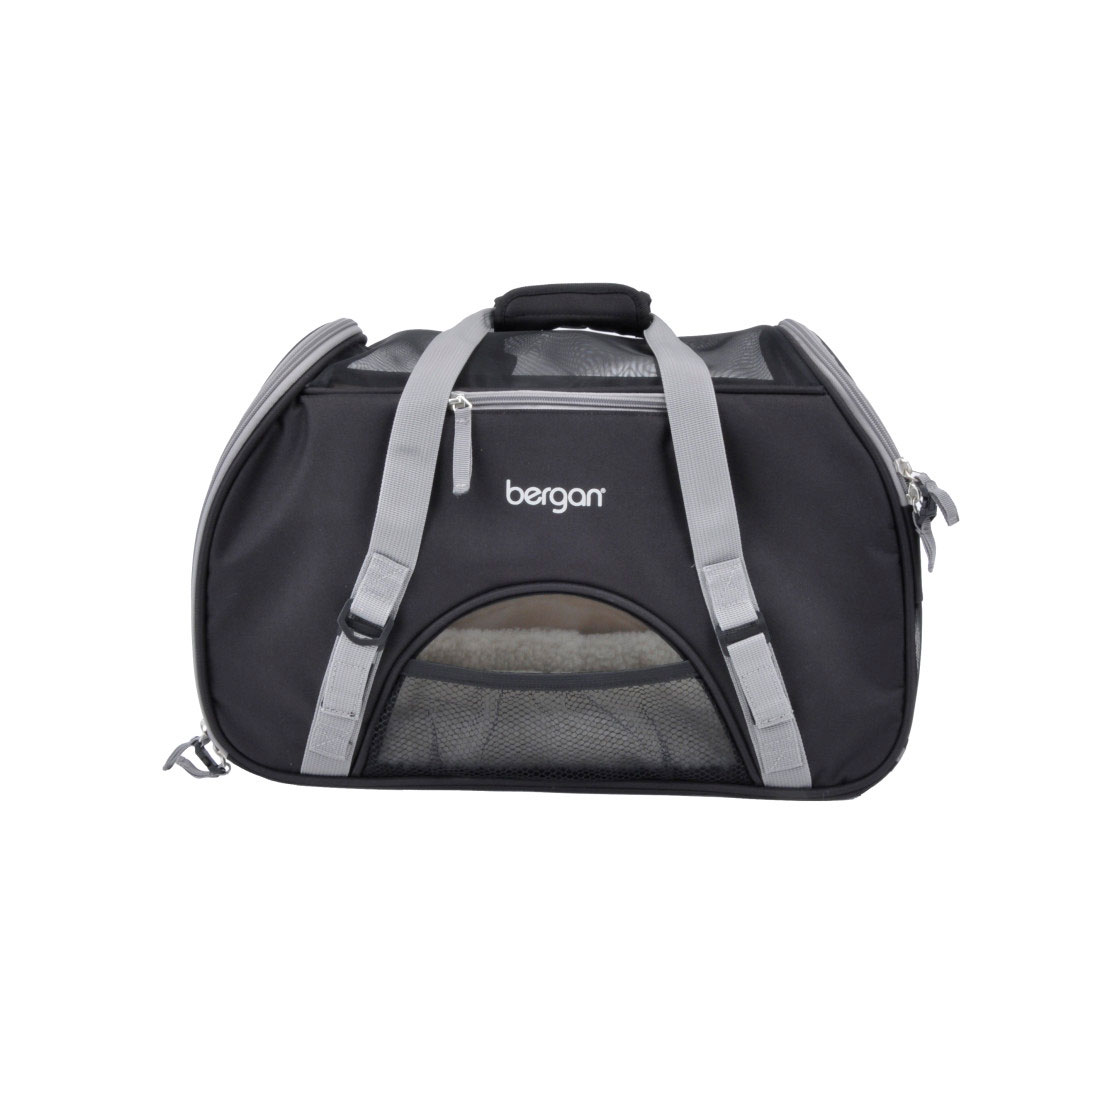 Bergan Comfort Pet Carrier, Black/Grey Image